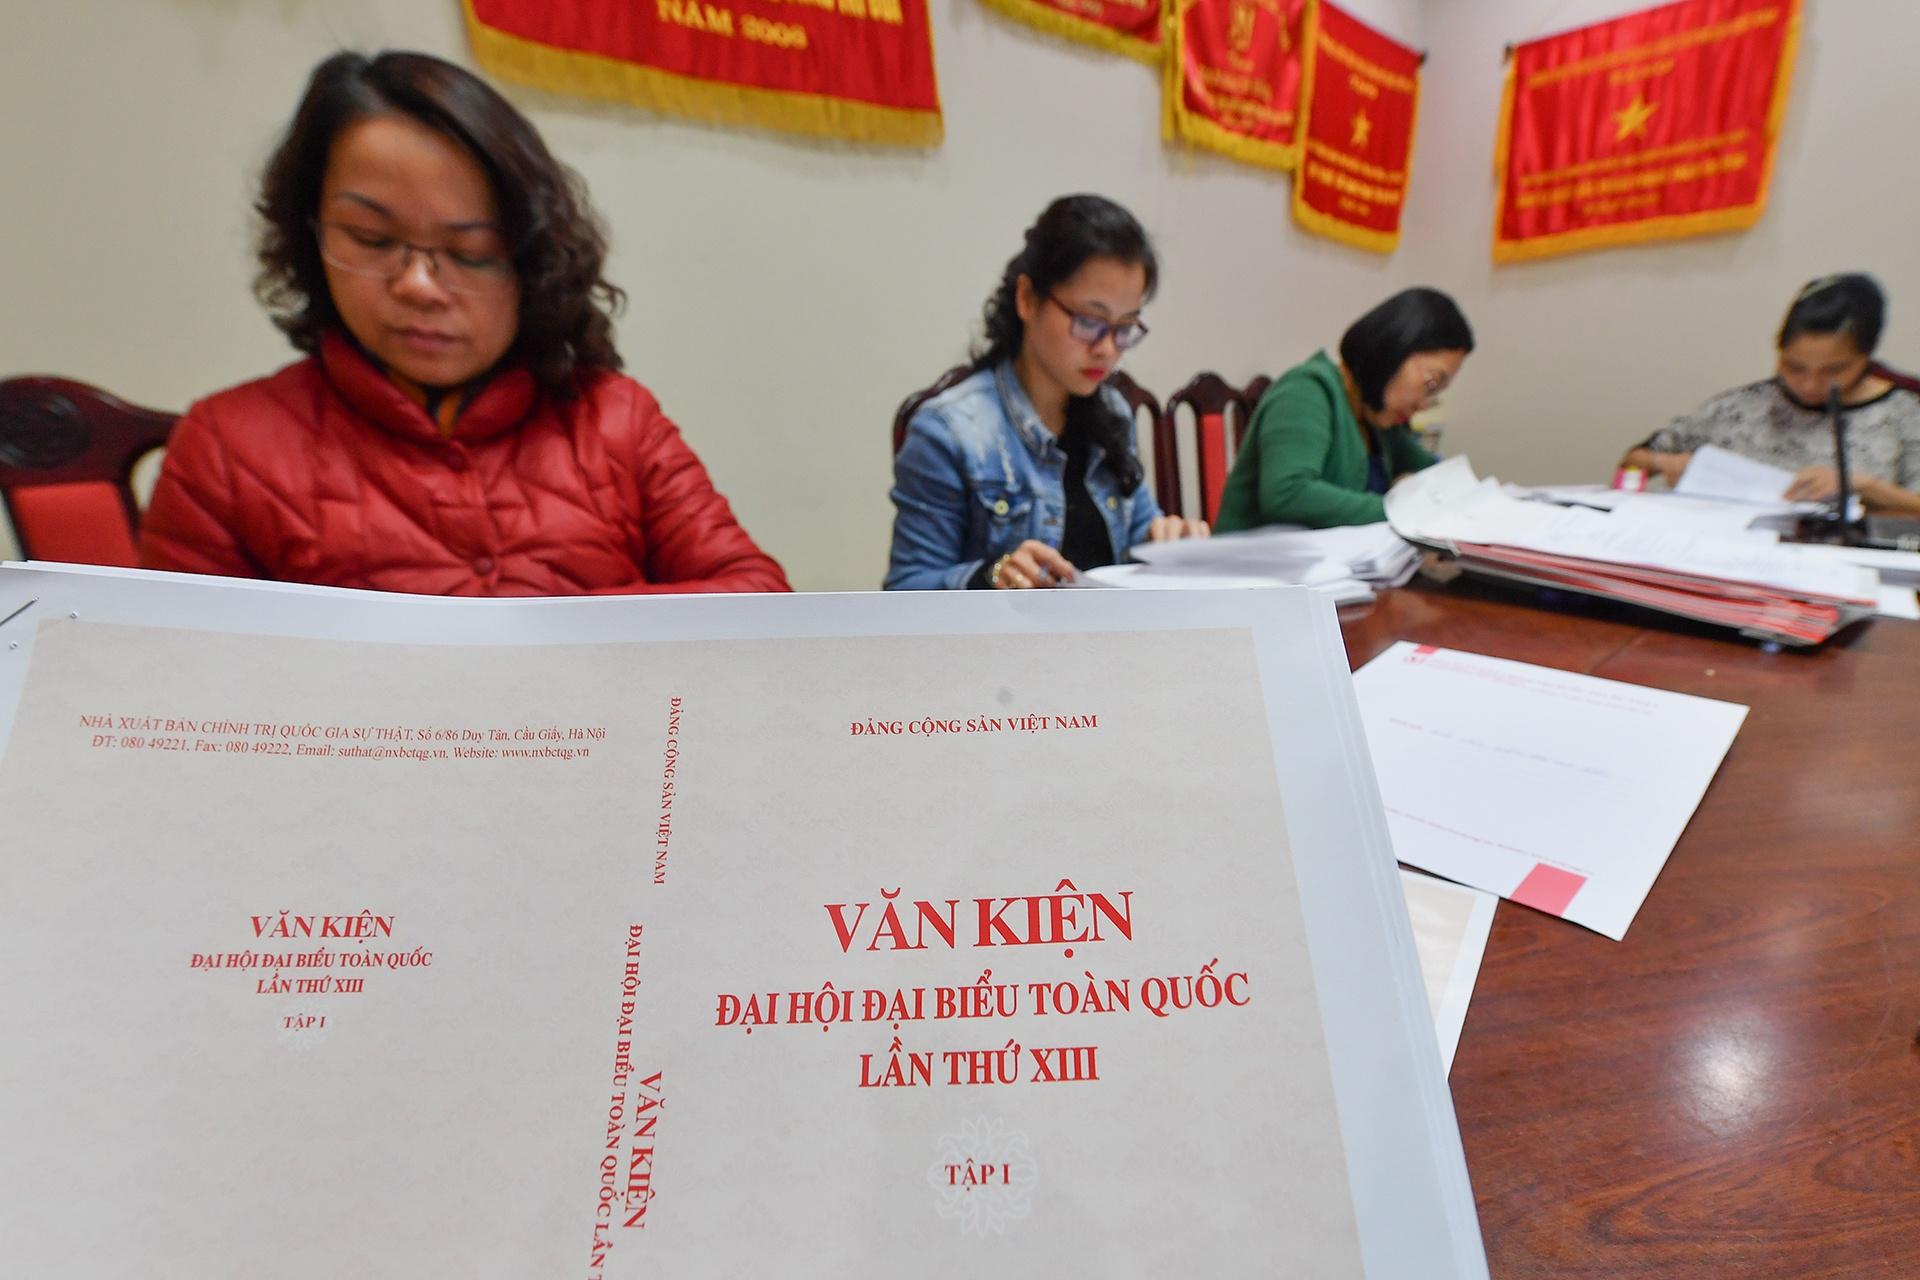 phat hanh Van kien Dai hoi Dang XIII anh 8